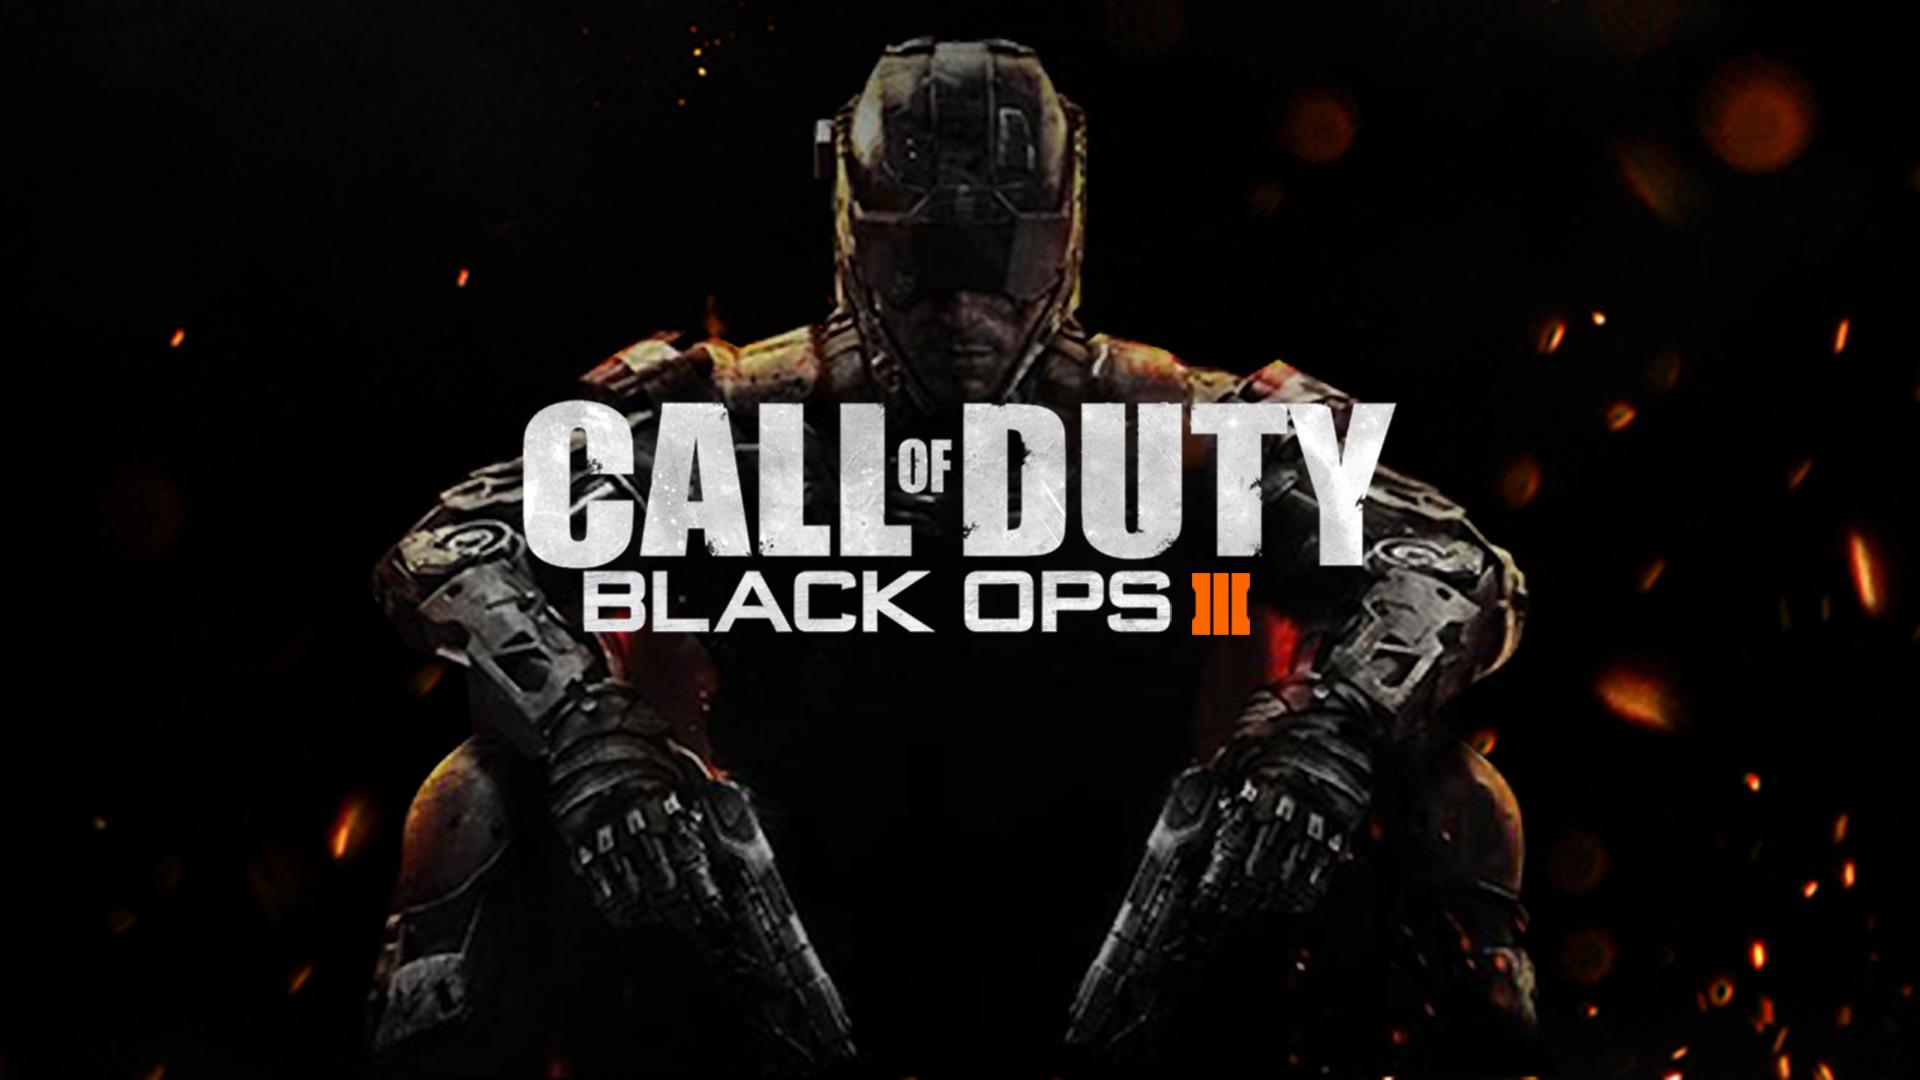 Black Ops 3 Hd Wallpaper: Black Ops 3 HD Wallpapers